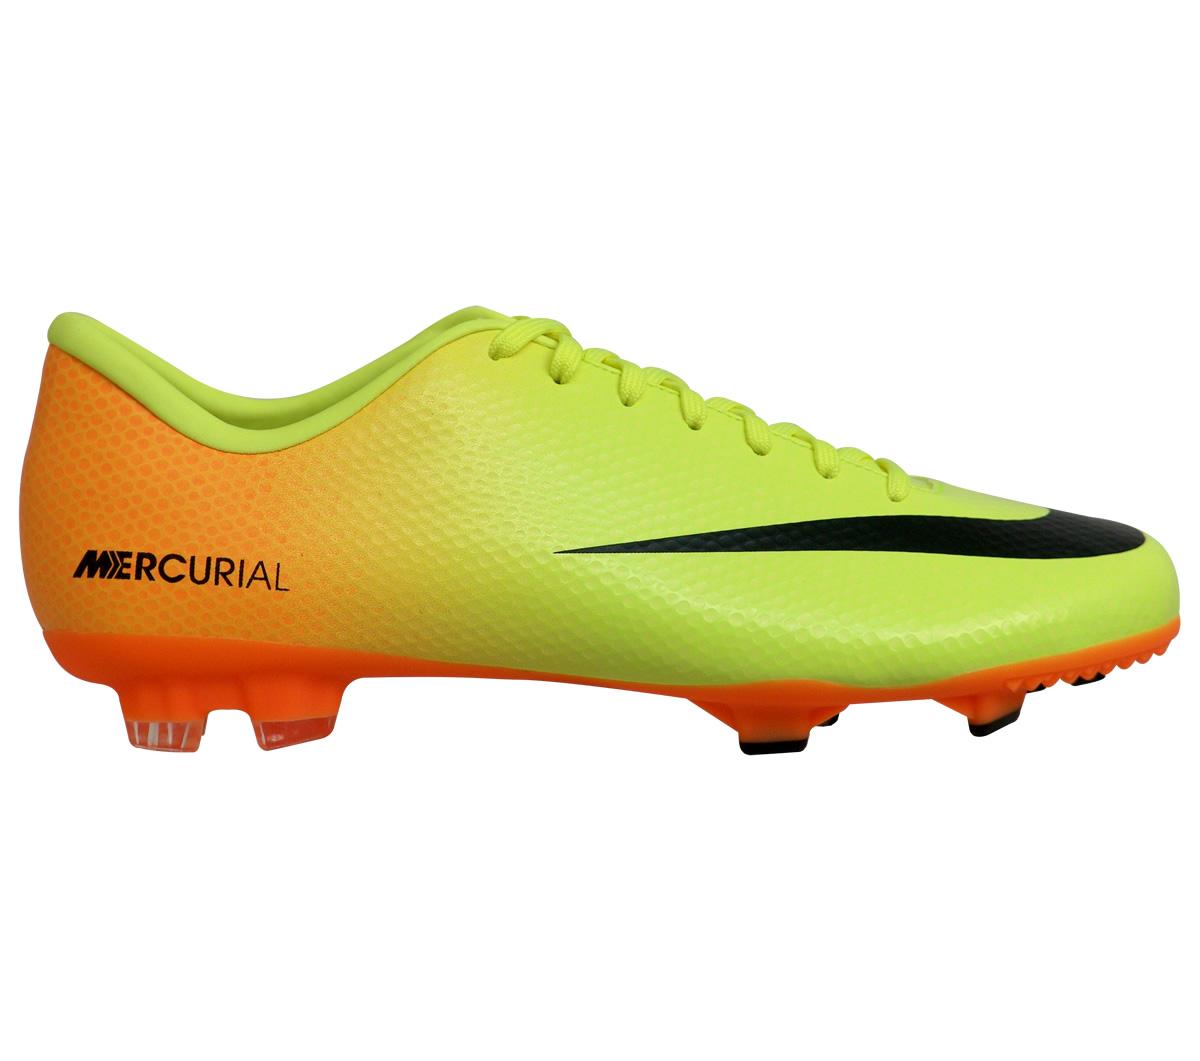 Chuteira Nike Mercurial Victory IV Campo Amarela e Laranja - Mundo ... f19d77016cbdf